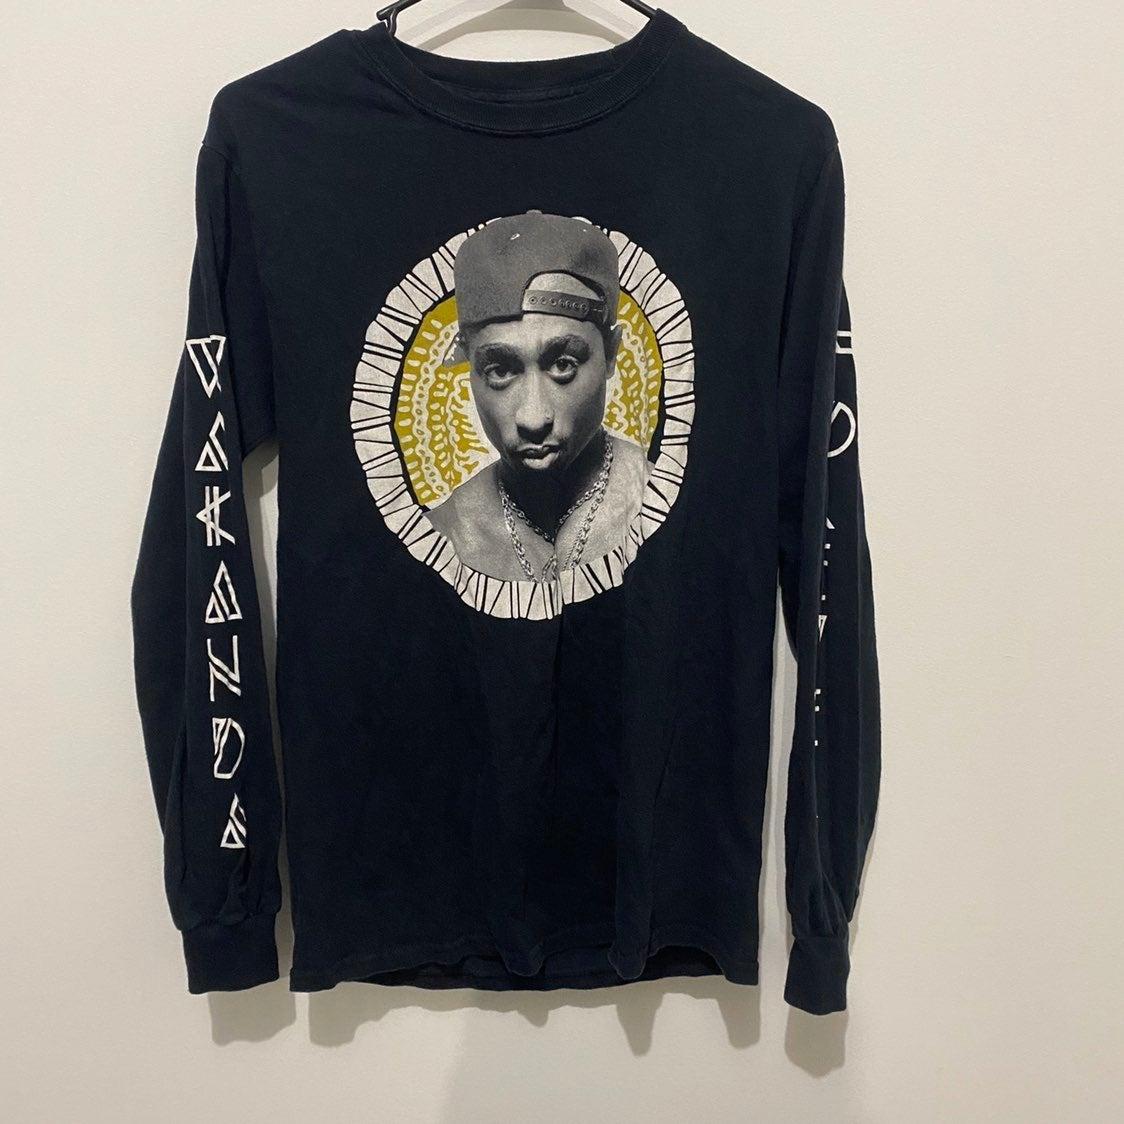 Tupac Shakur Long Sleeve Tee Shirt Small